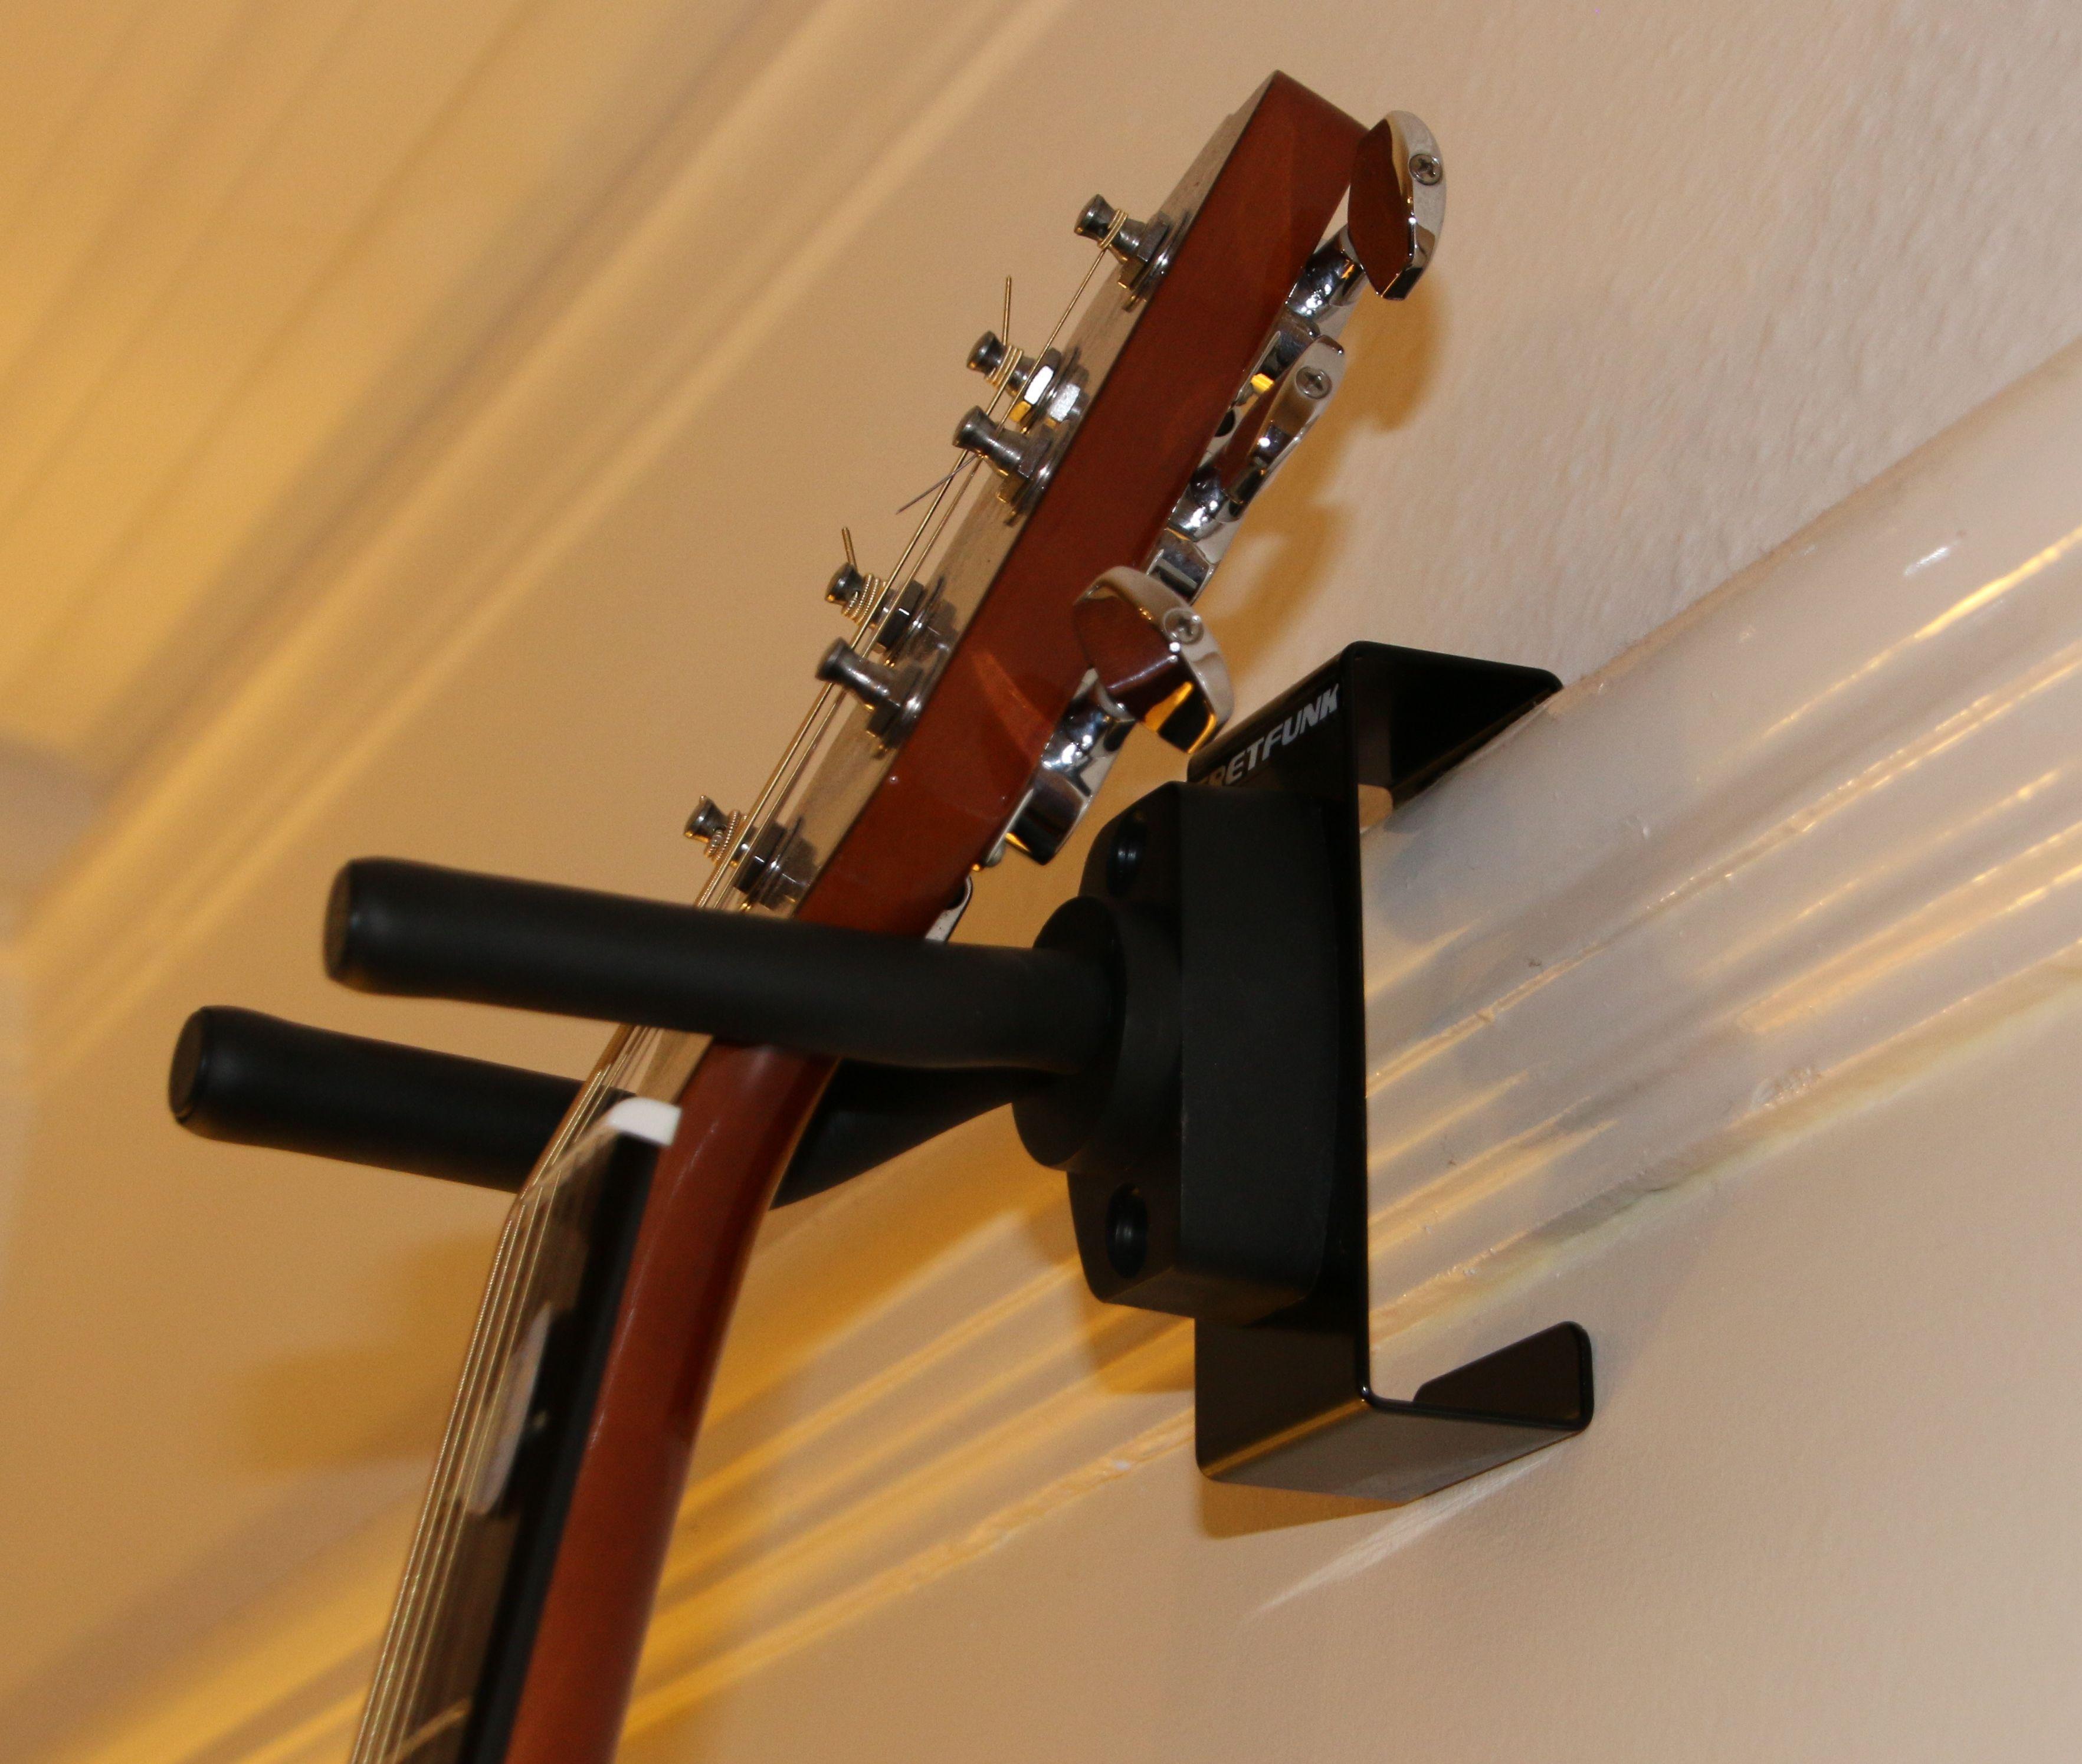 Funky Gear Picture Rail Instrument Hanger Guitar Stuff